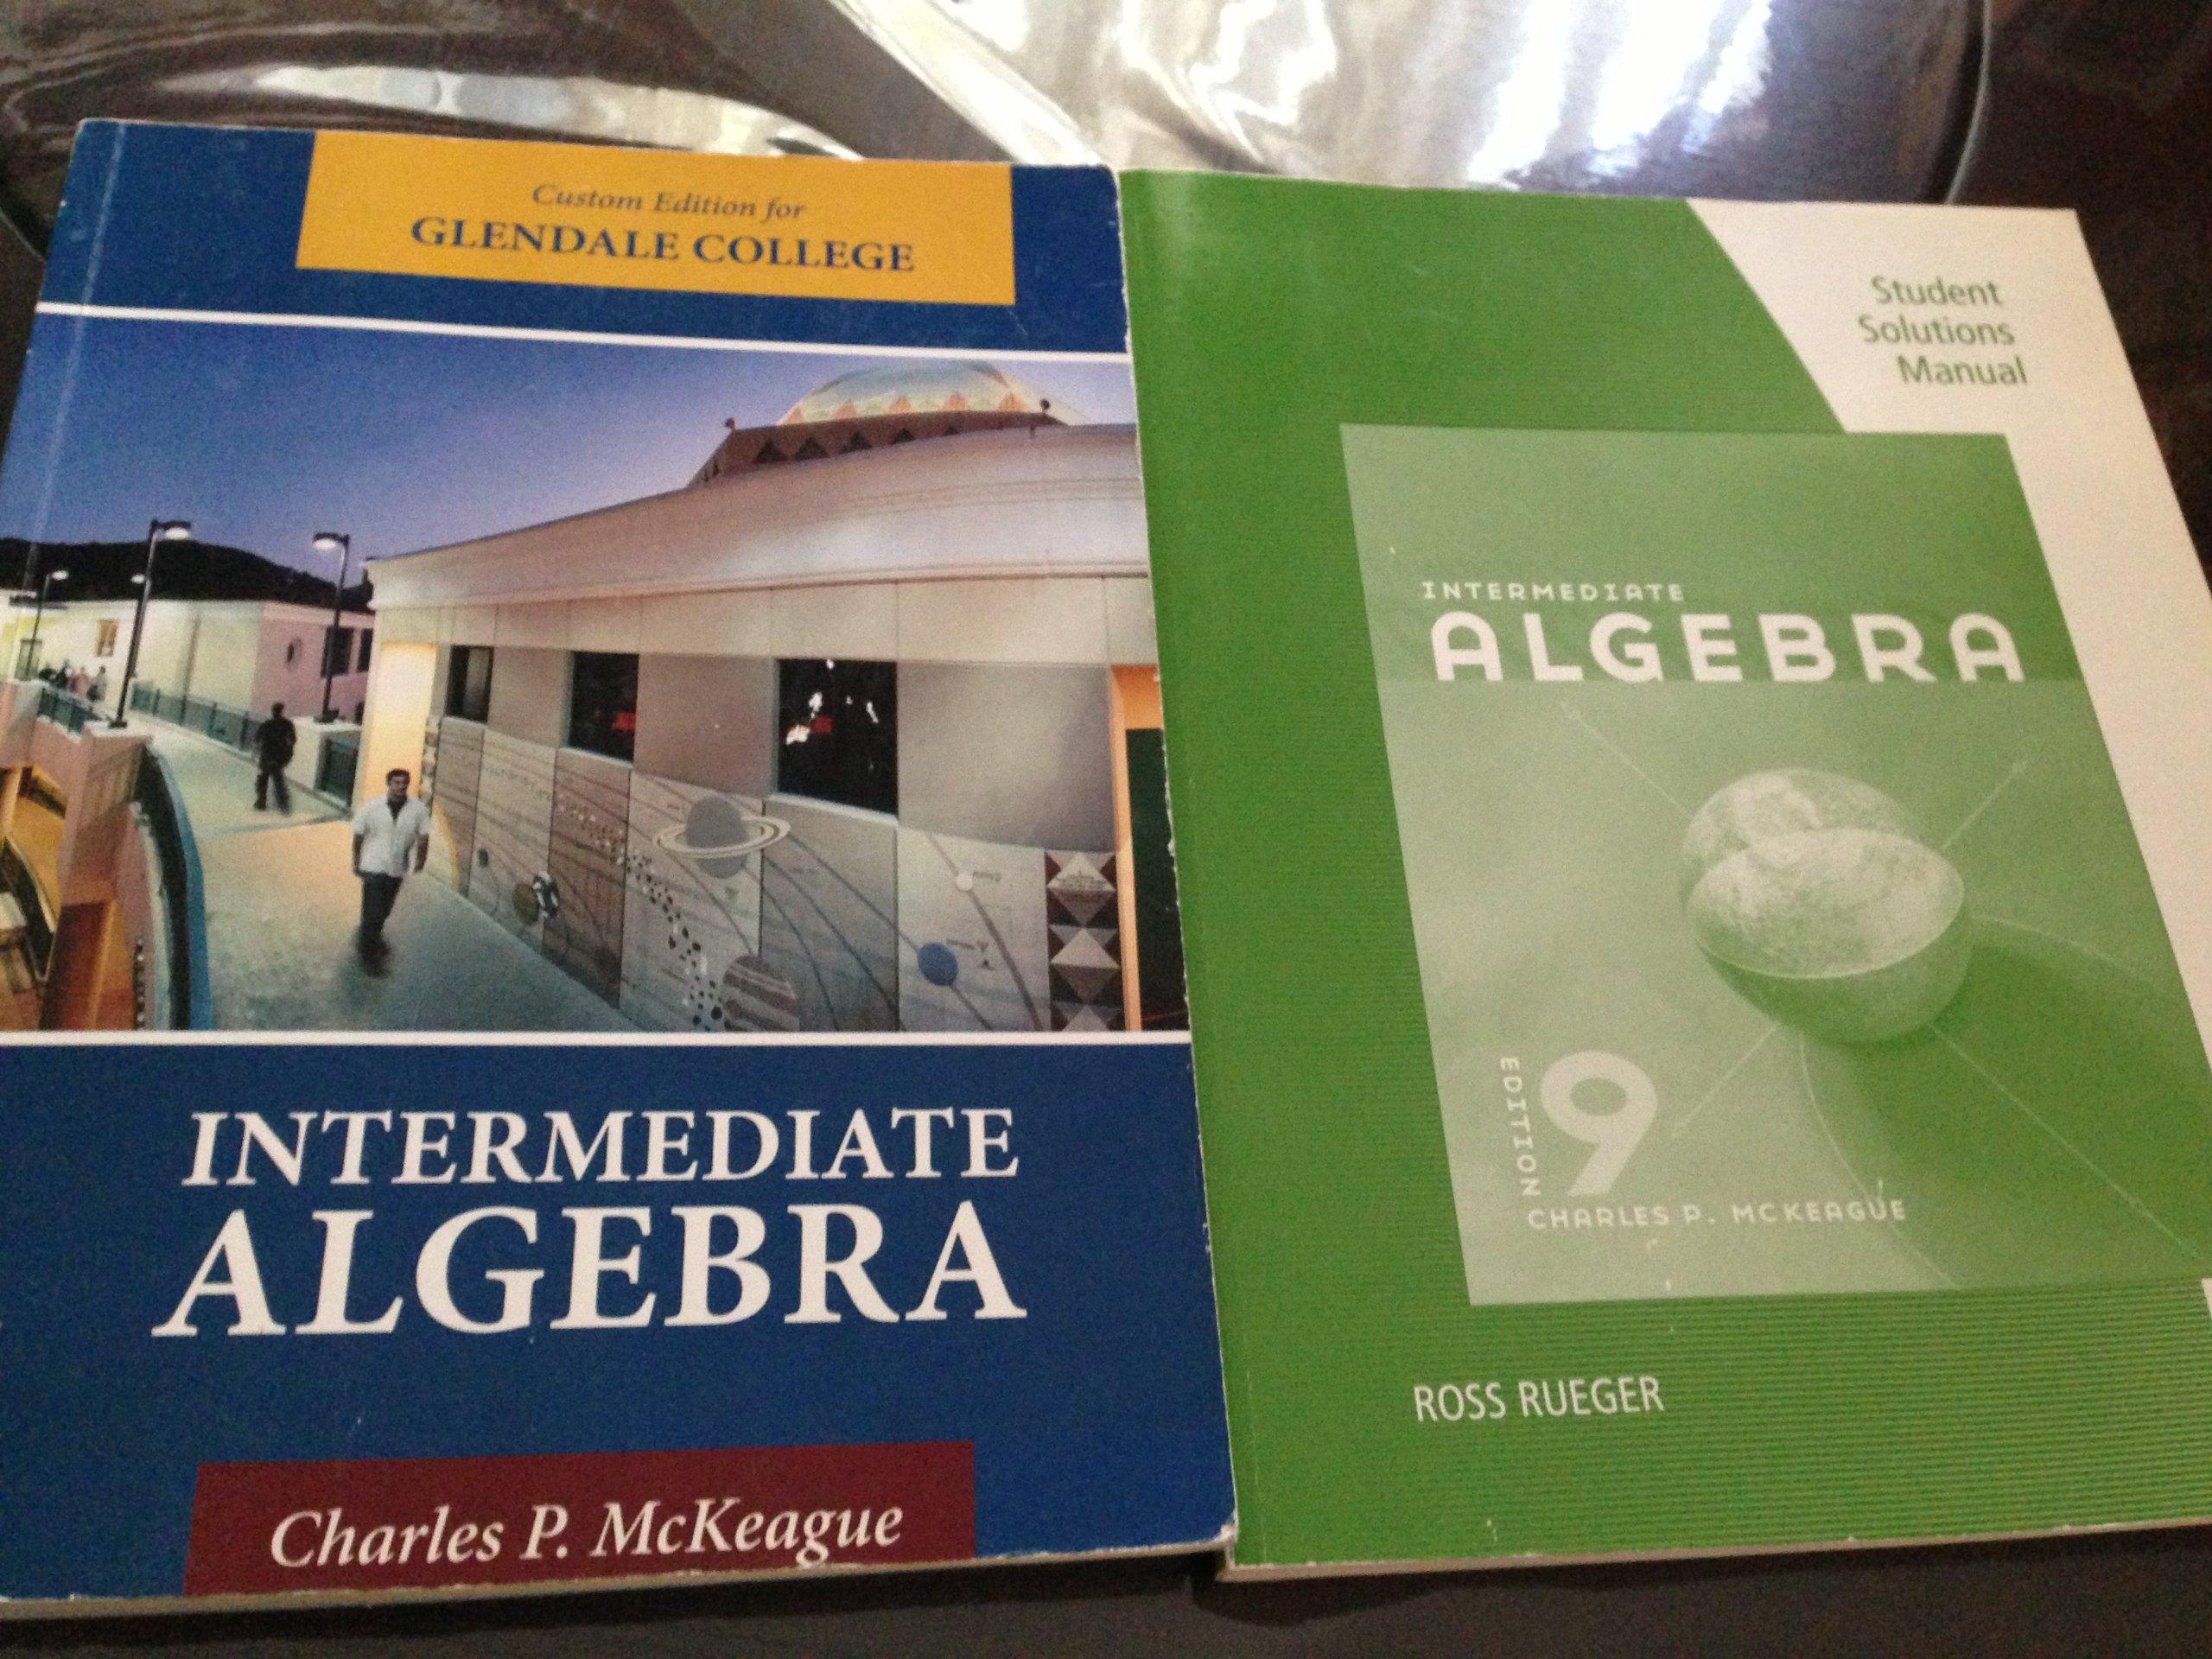 intermediate algebra glendale community college edition charles p rh amazon com Intermediate Algebra Concepts Applications Intermediate Algebra McKeague 9th Edition